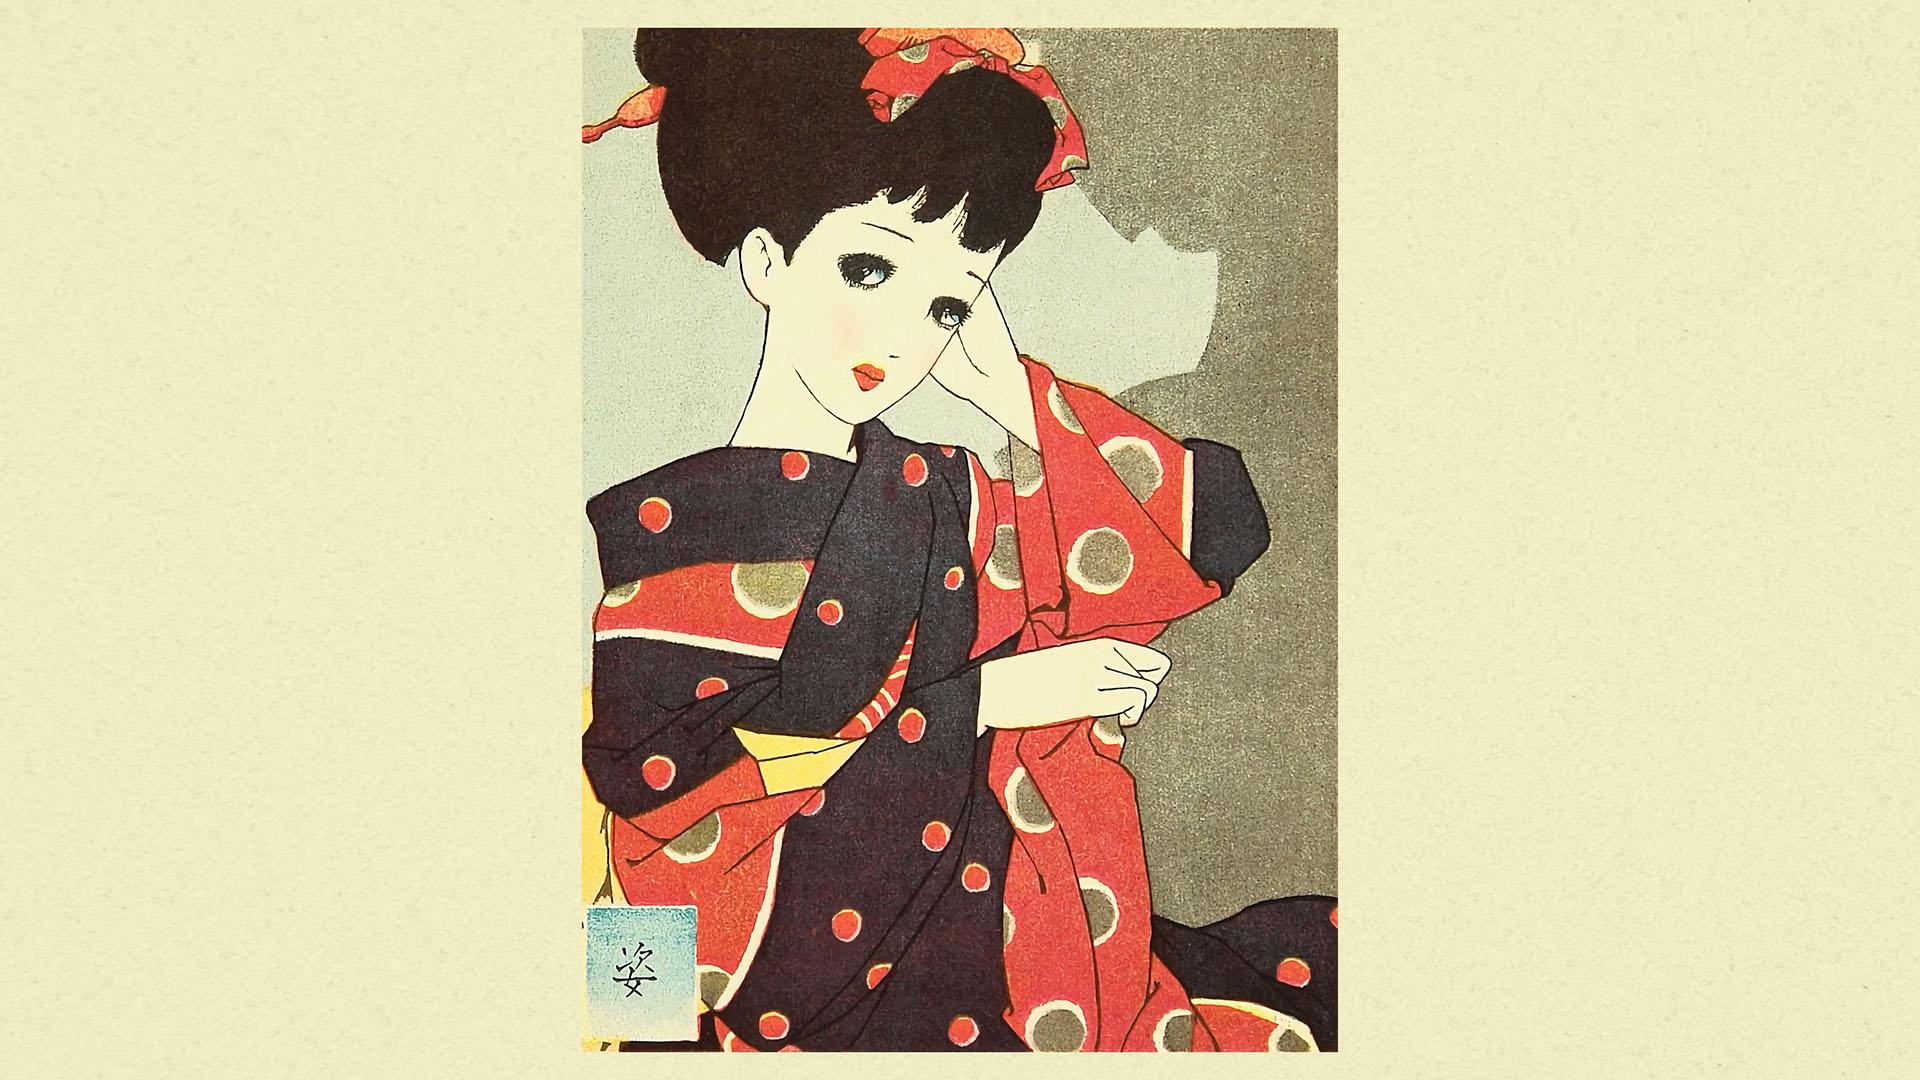 Nakahara Junichi - Sugata 1920x1080